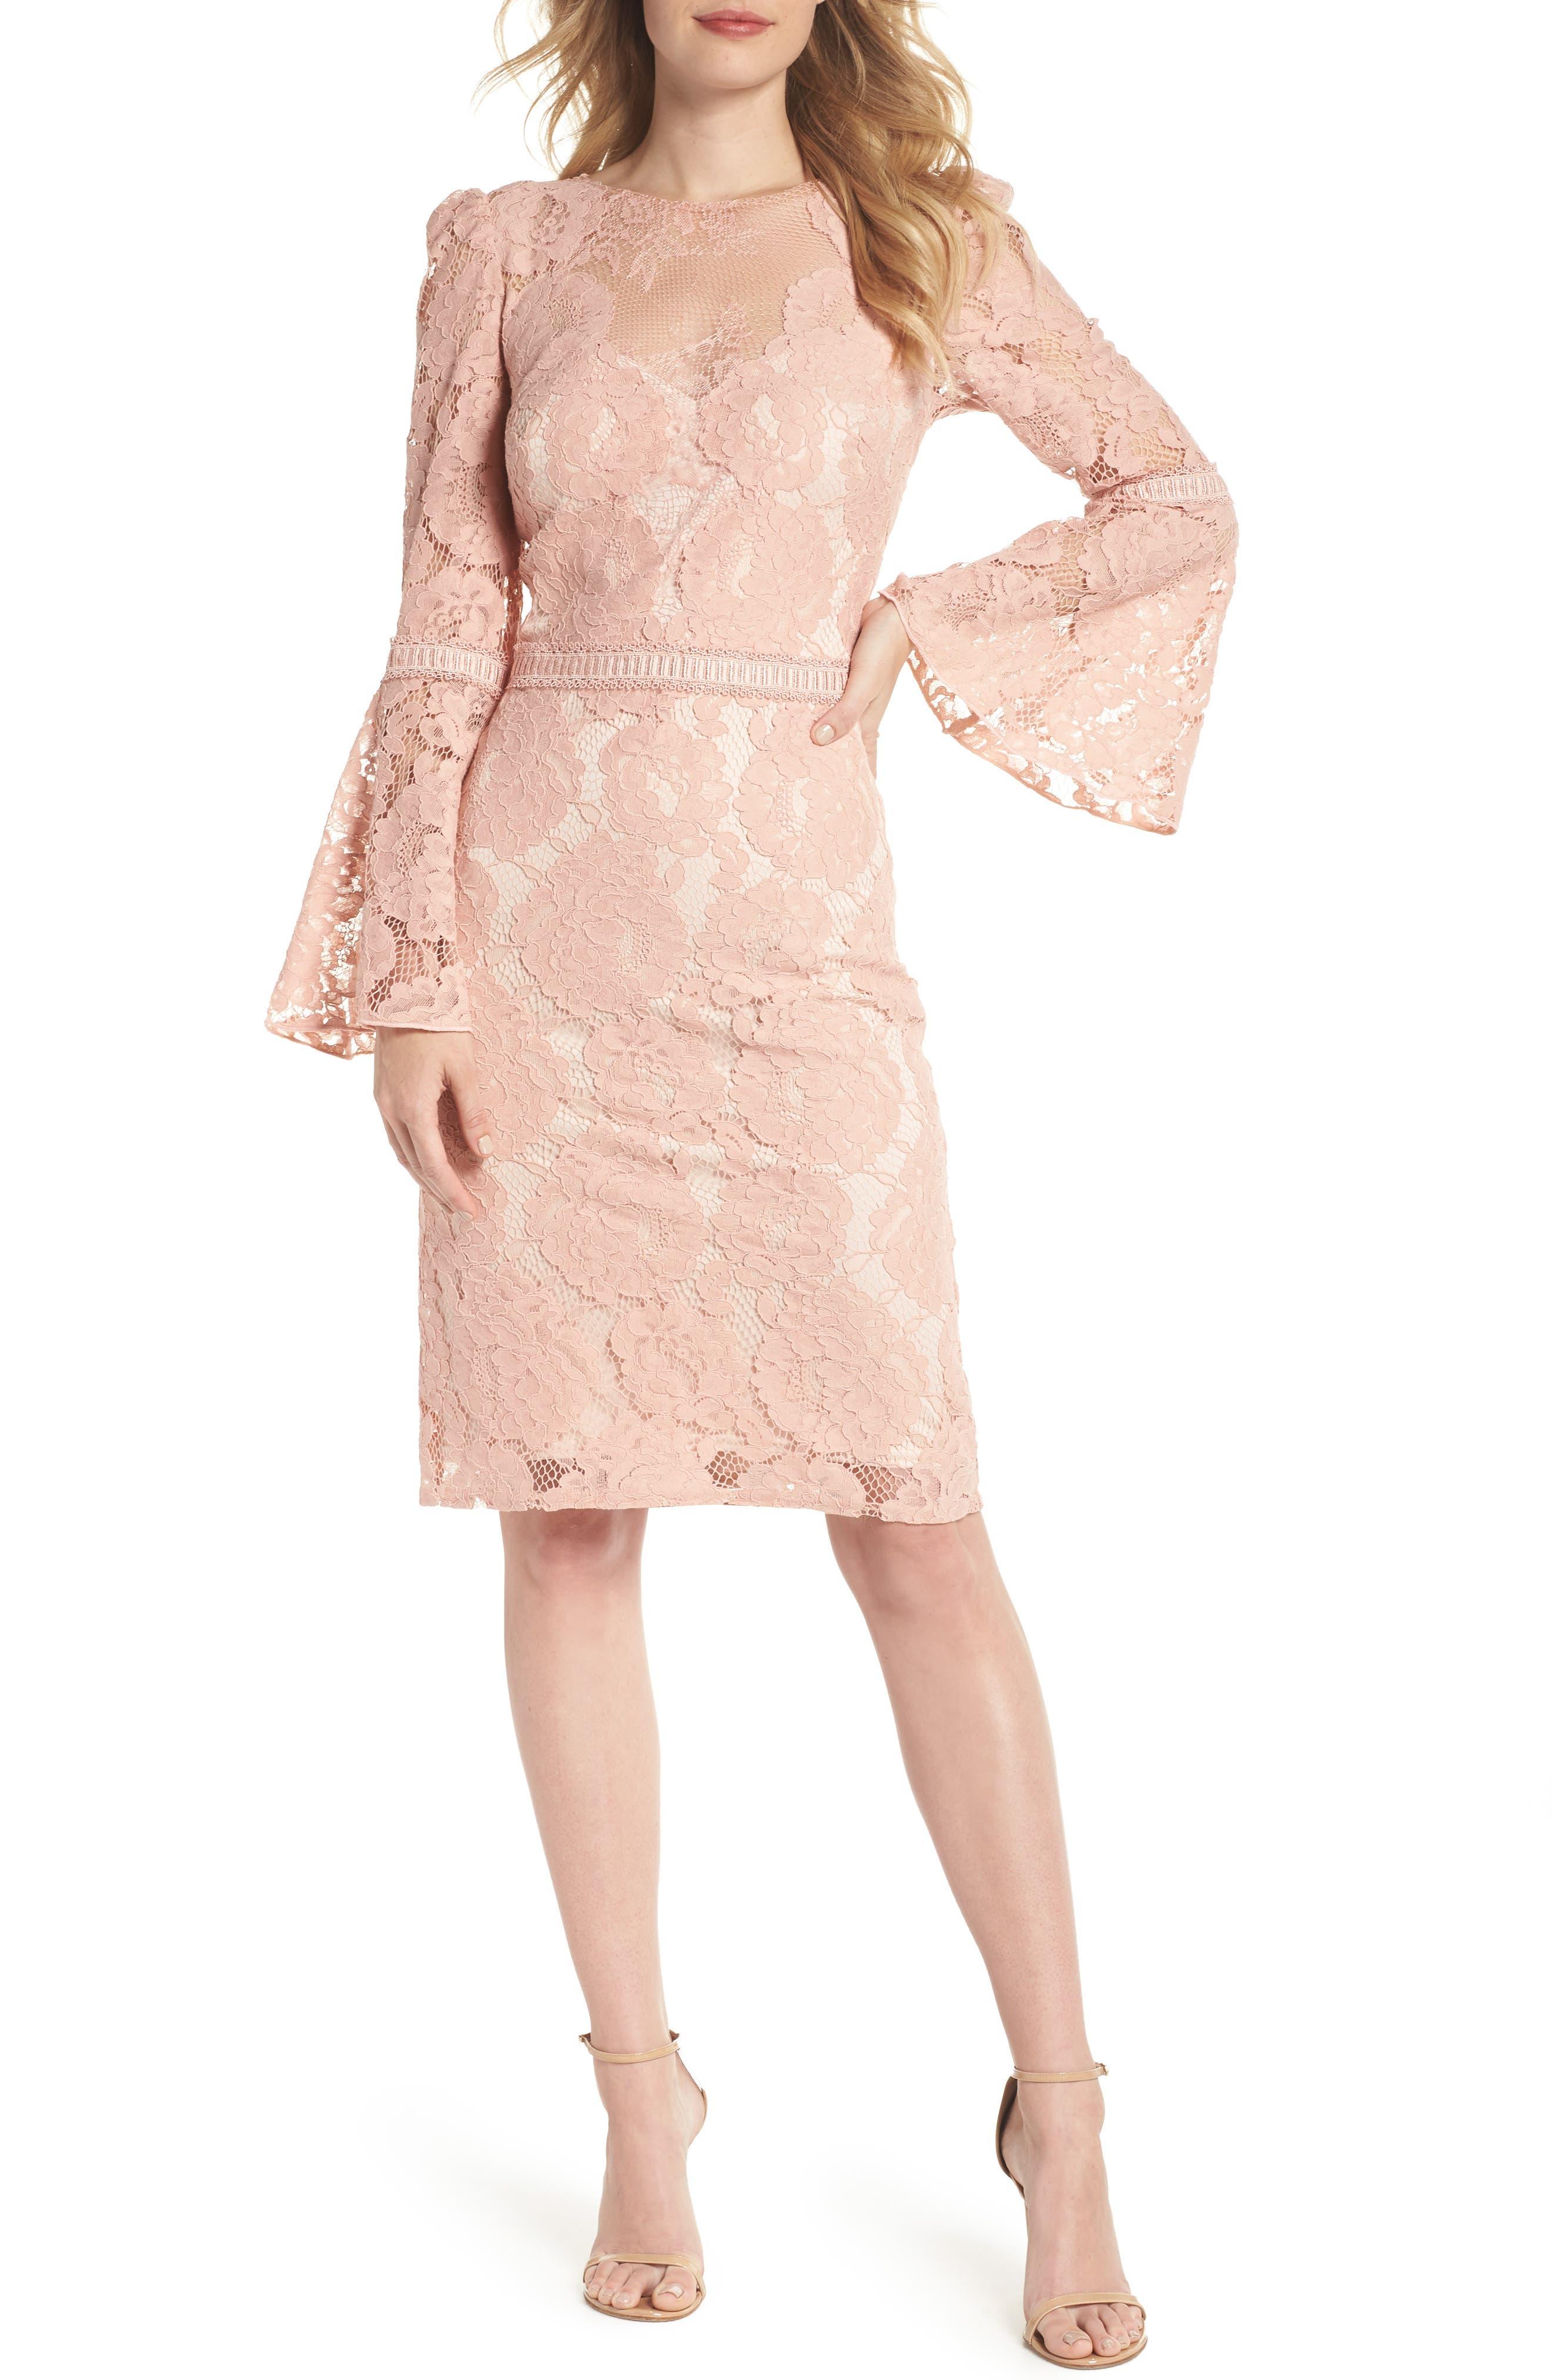 Tadashi Shoji Lace Bell Sleeve Dress